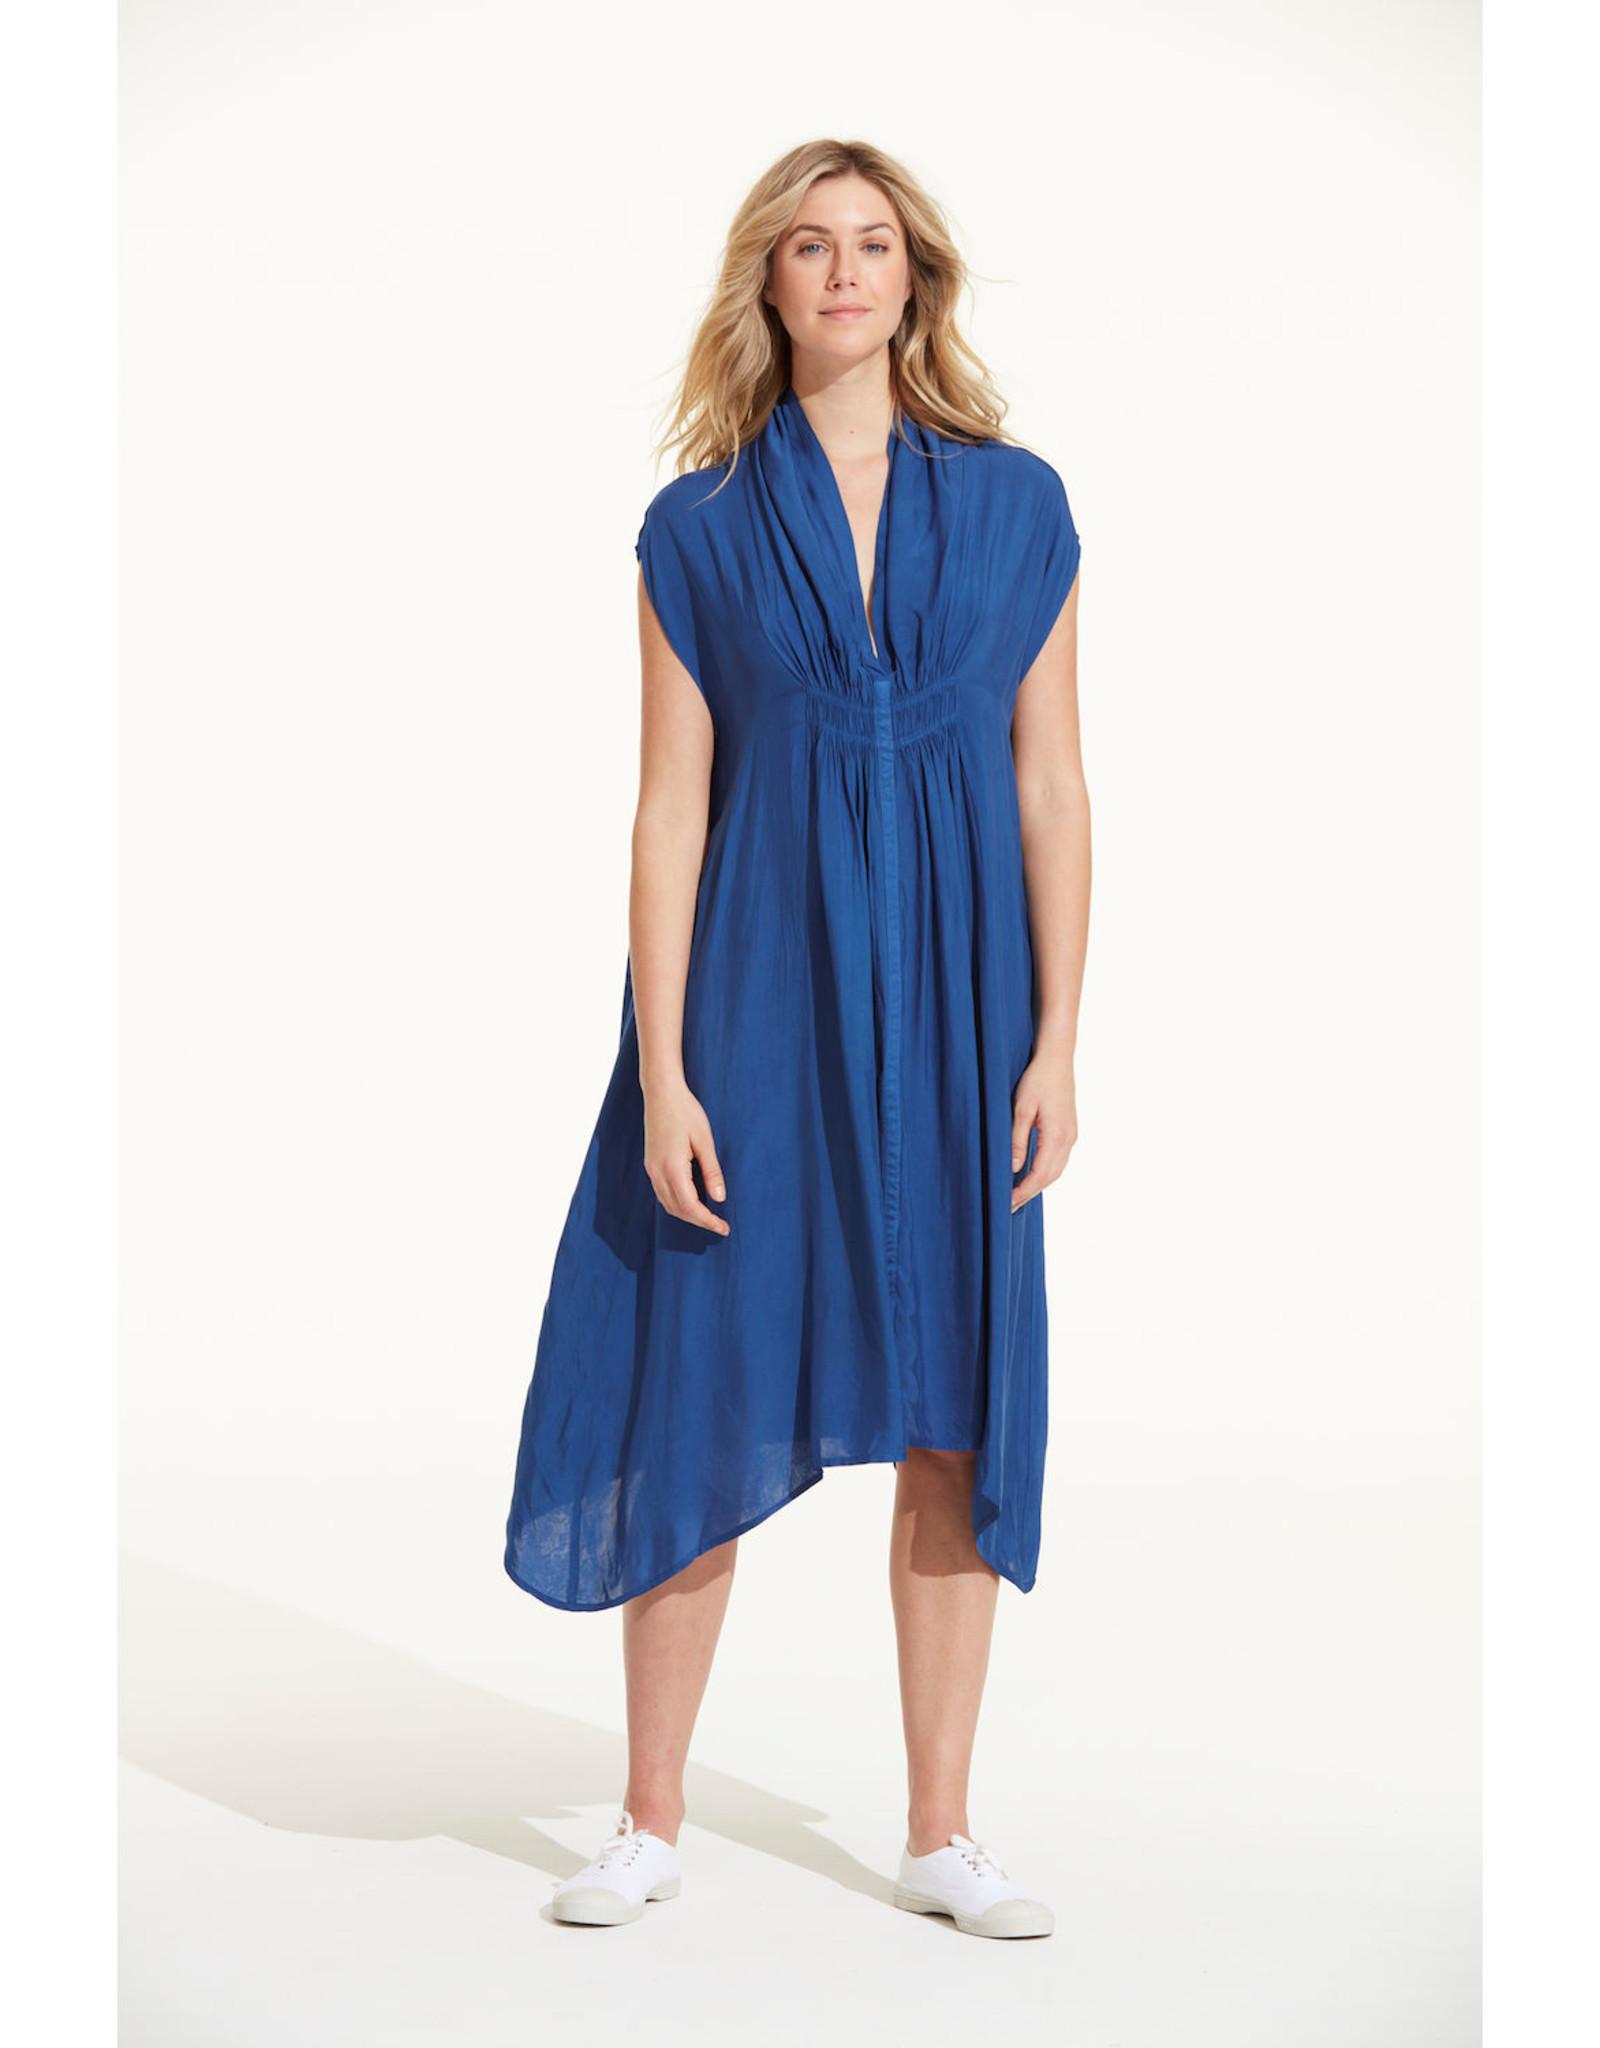 SALE - ONESEASON FLO DRESS ROYAL BLUE